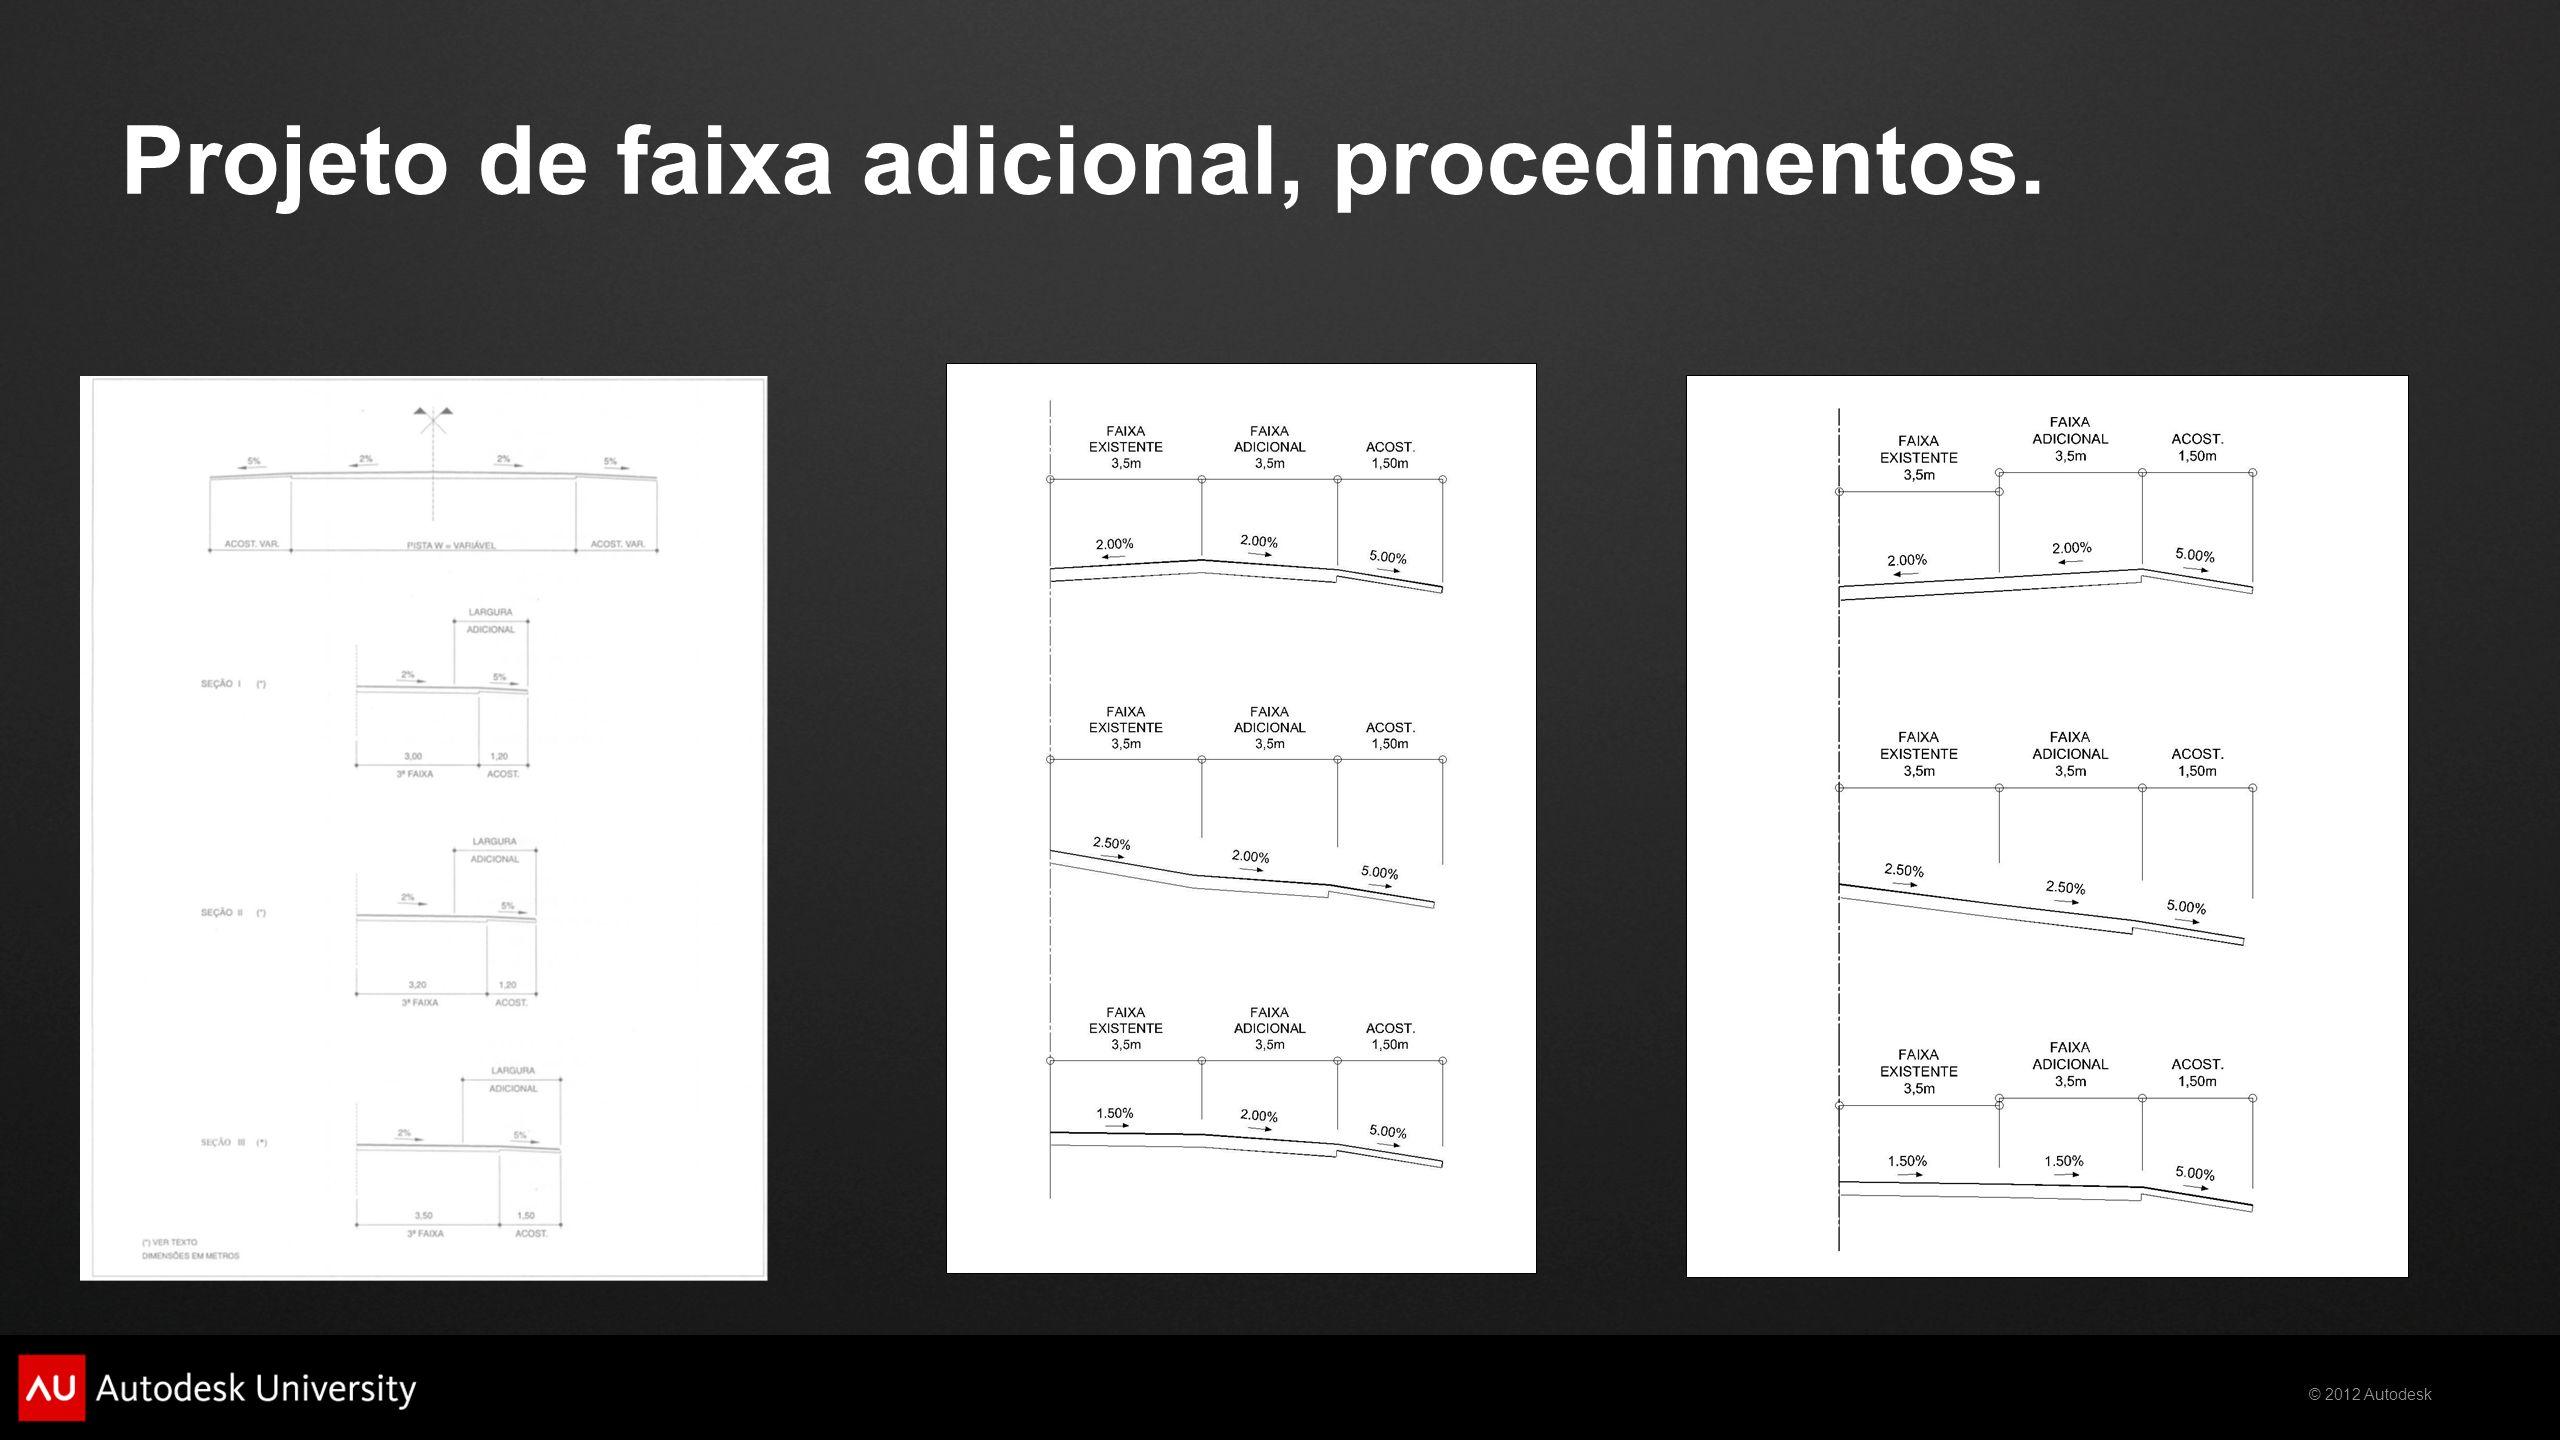 Projeto de faixa adicional, procedimentos.